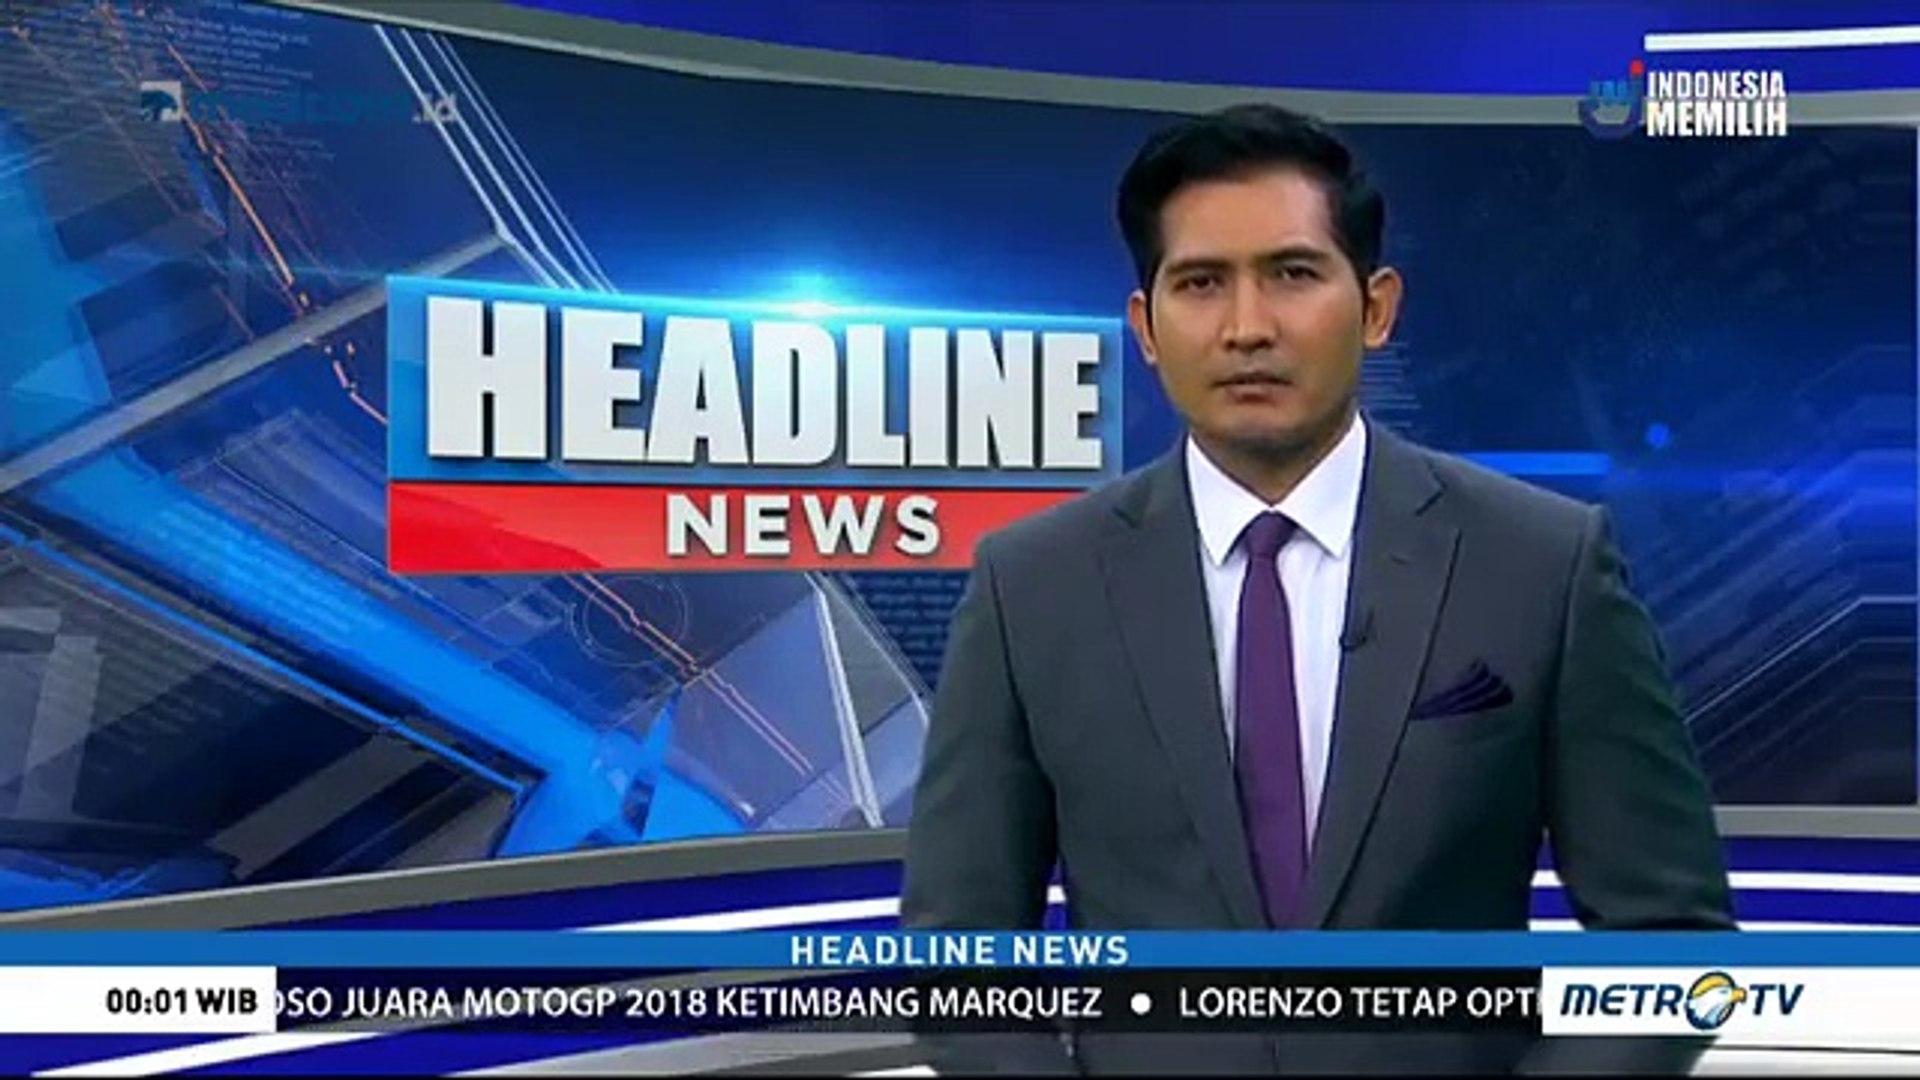 Berita Terbaru 7 April 2018 - KPK Lantik Deputi Penindakan Hari Ini…